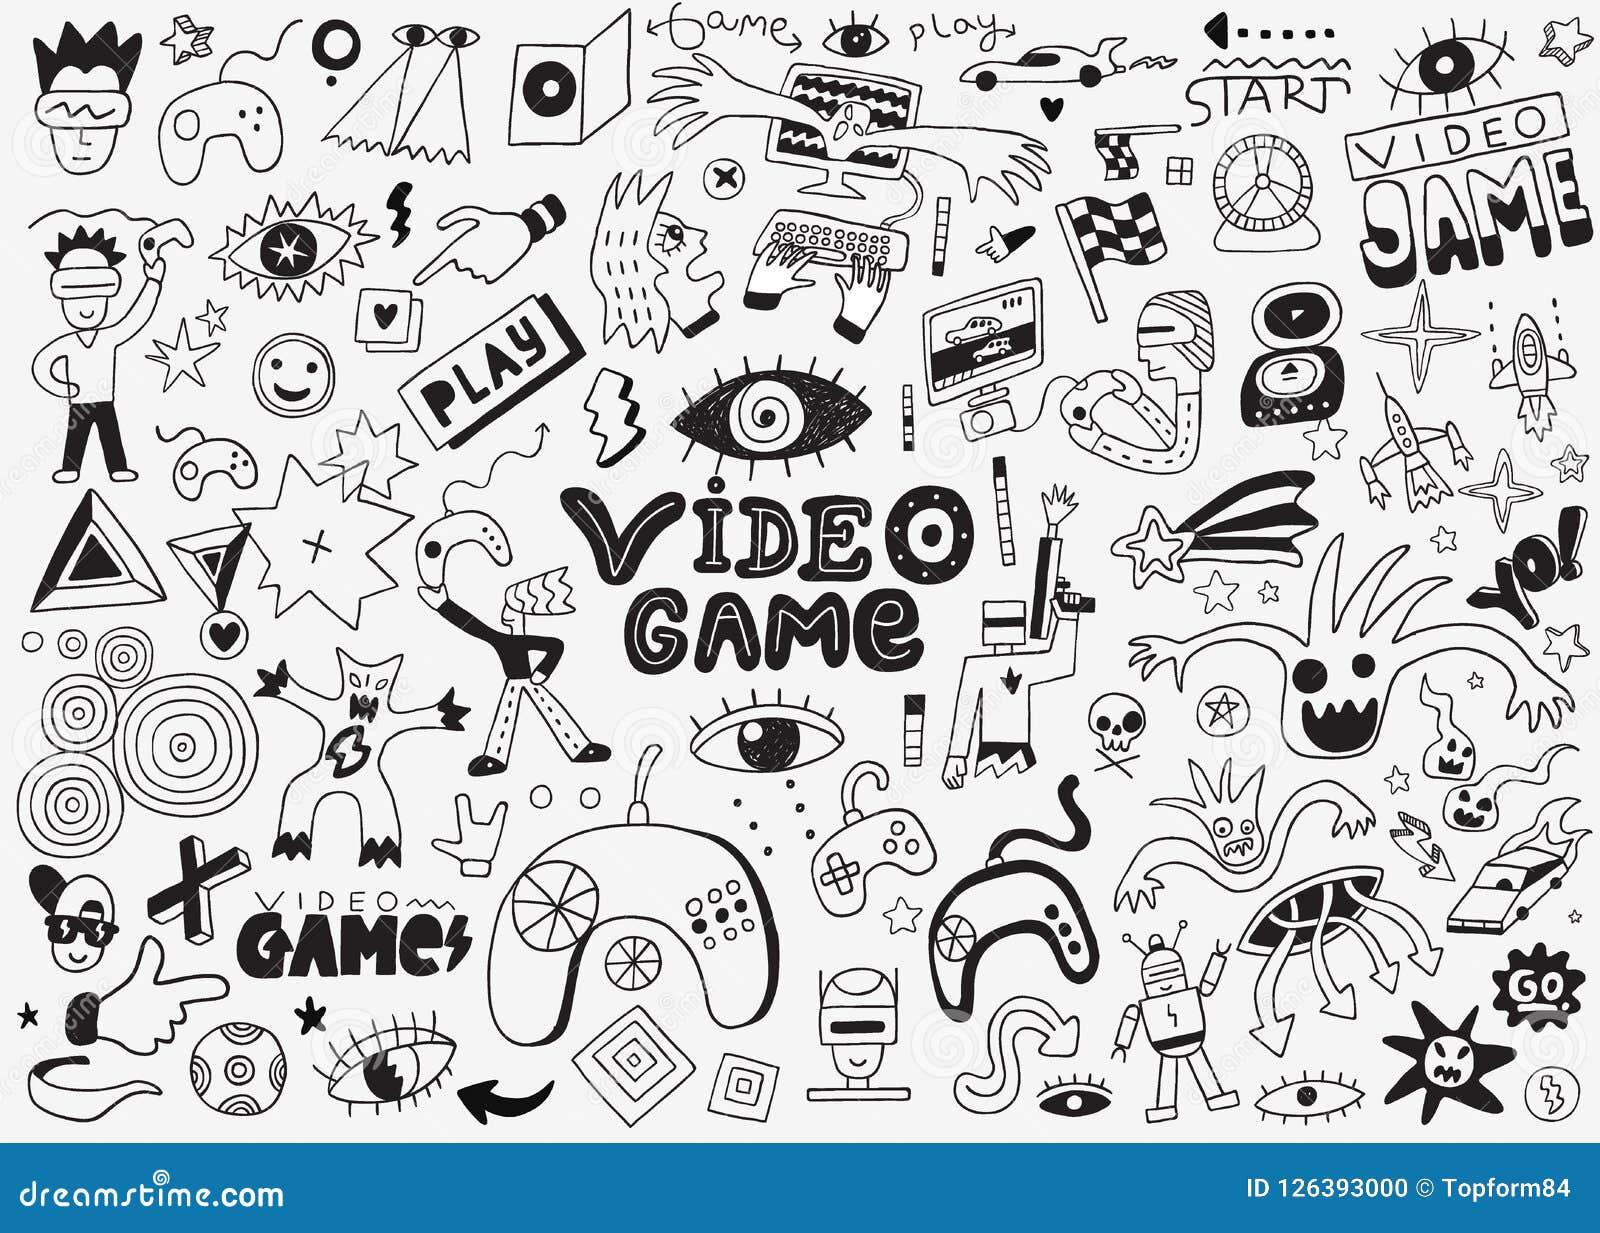 Video Games Vector Doodle Set Pencil Drawings Stock Vector